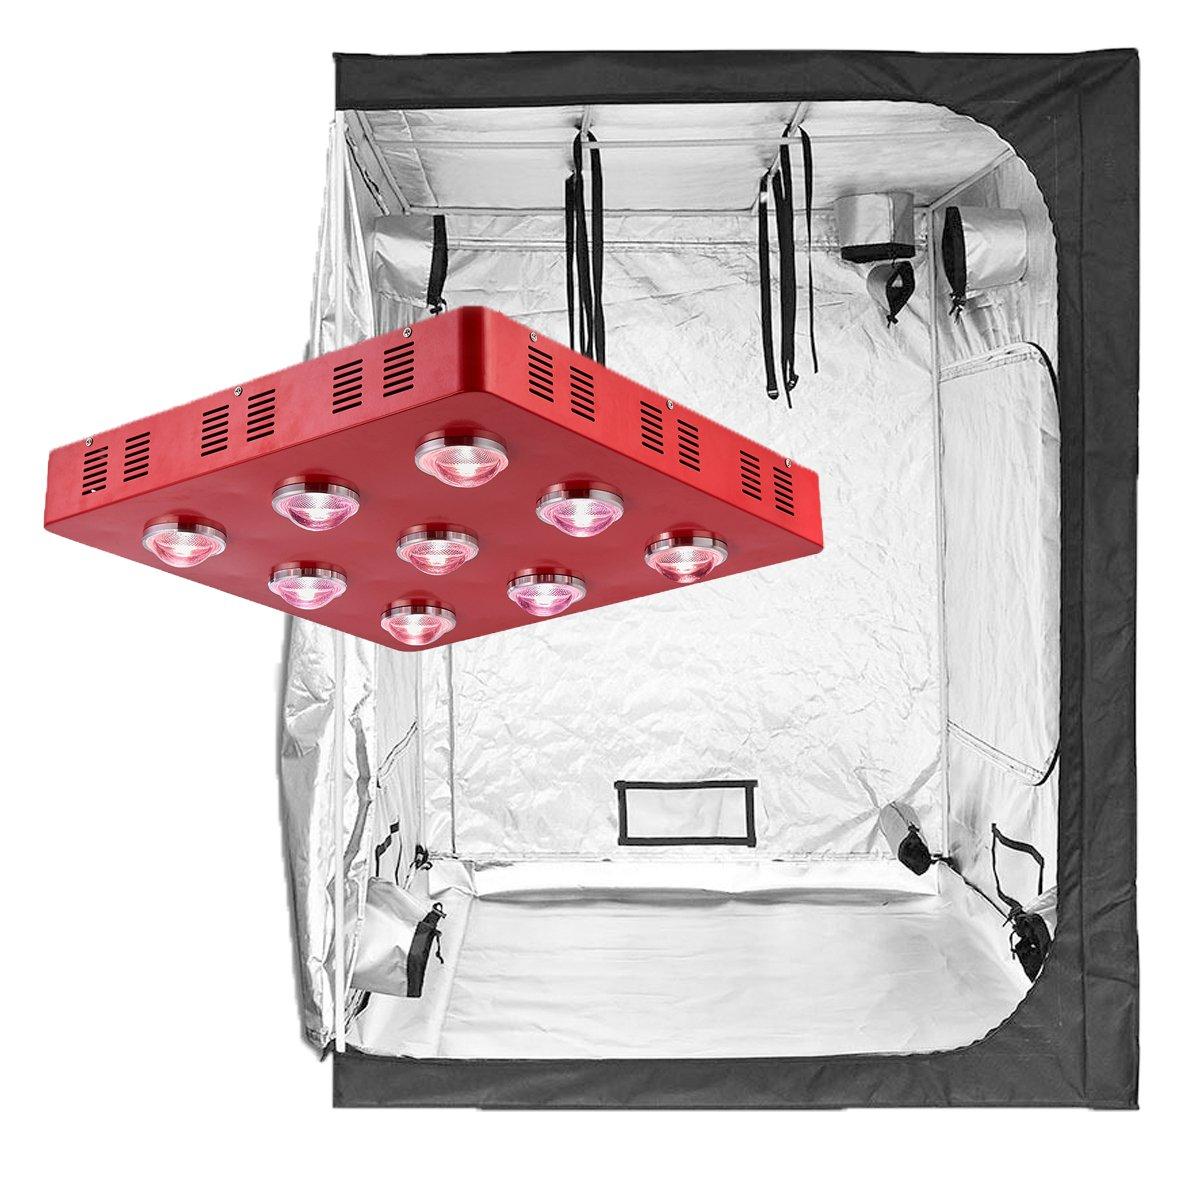 TopoLite 300W/ 600W/ 800W/ 1200W Full Spectrum LED Grow Light + Multiple Size Grow Tent Dark Room Indoor Hydroponic System Kit (LED 1800W, 60''X60''X80'')